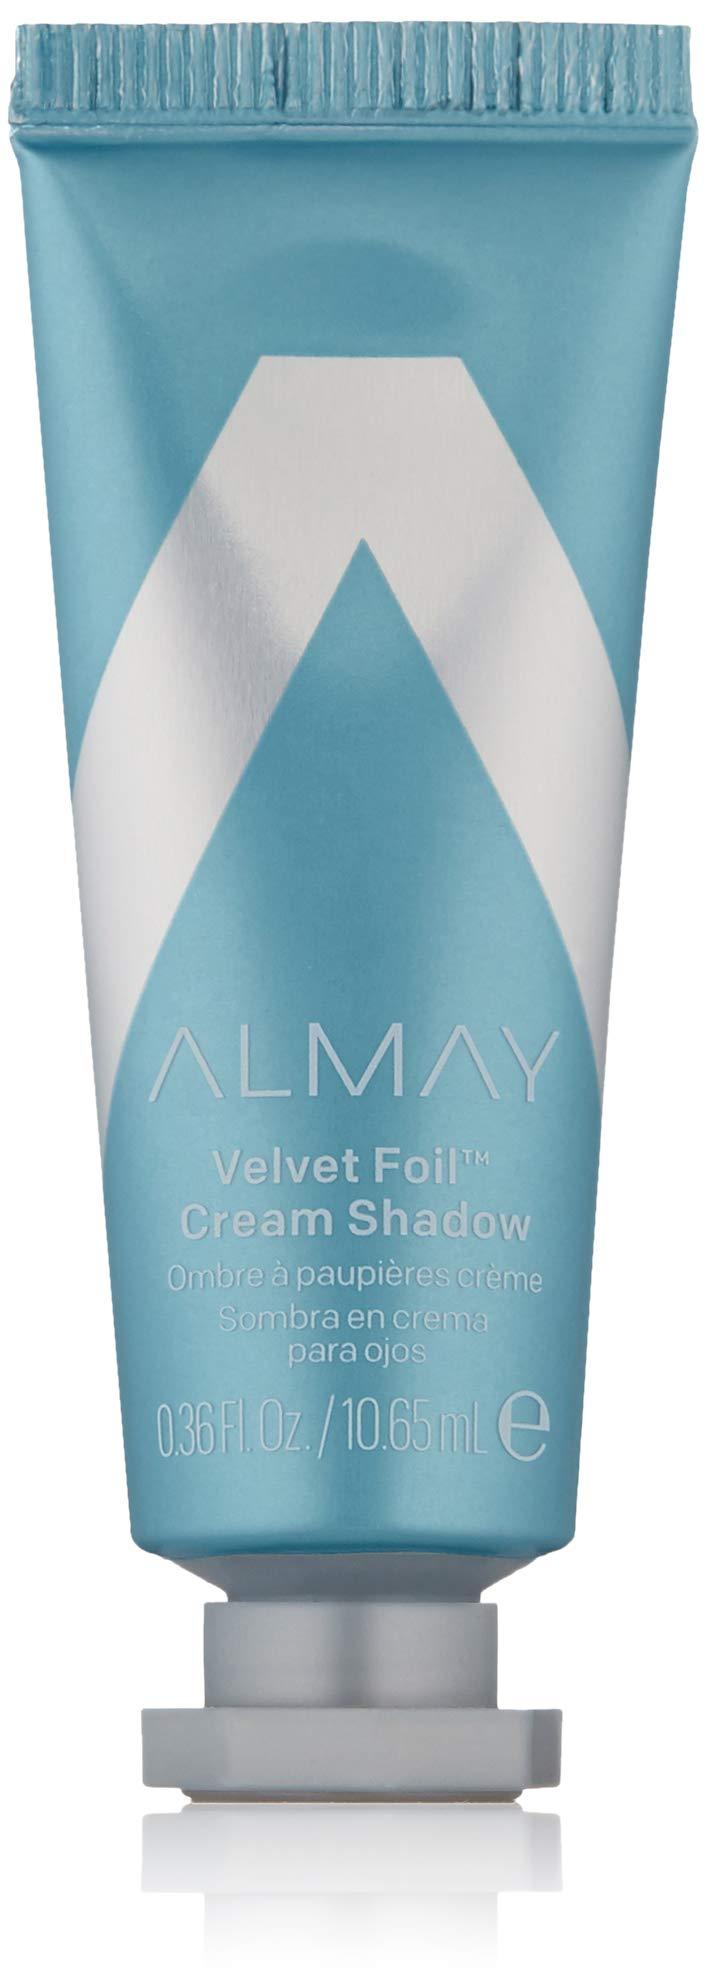 Almay Velvet Foil Cream Shadow, Infinite Sky, 0.36 fl. oz, metallic eyeshadow